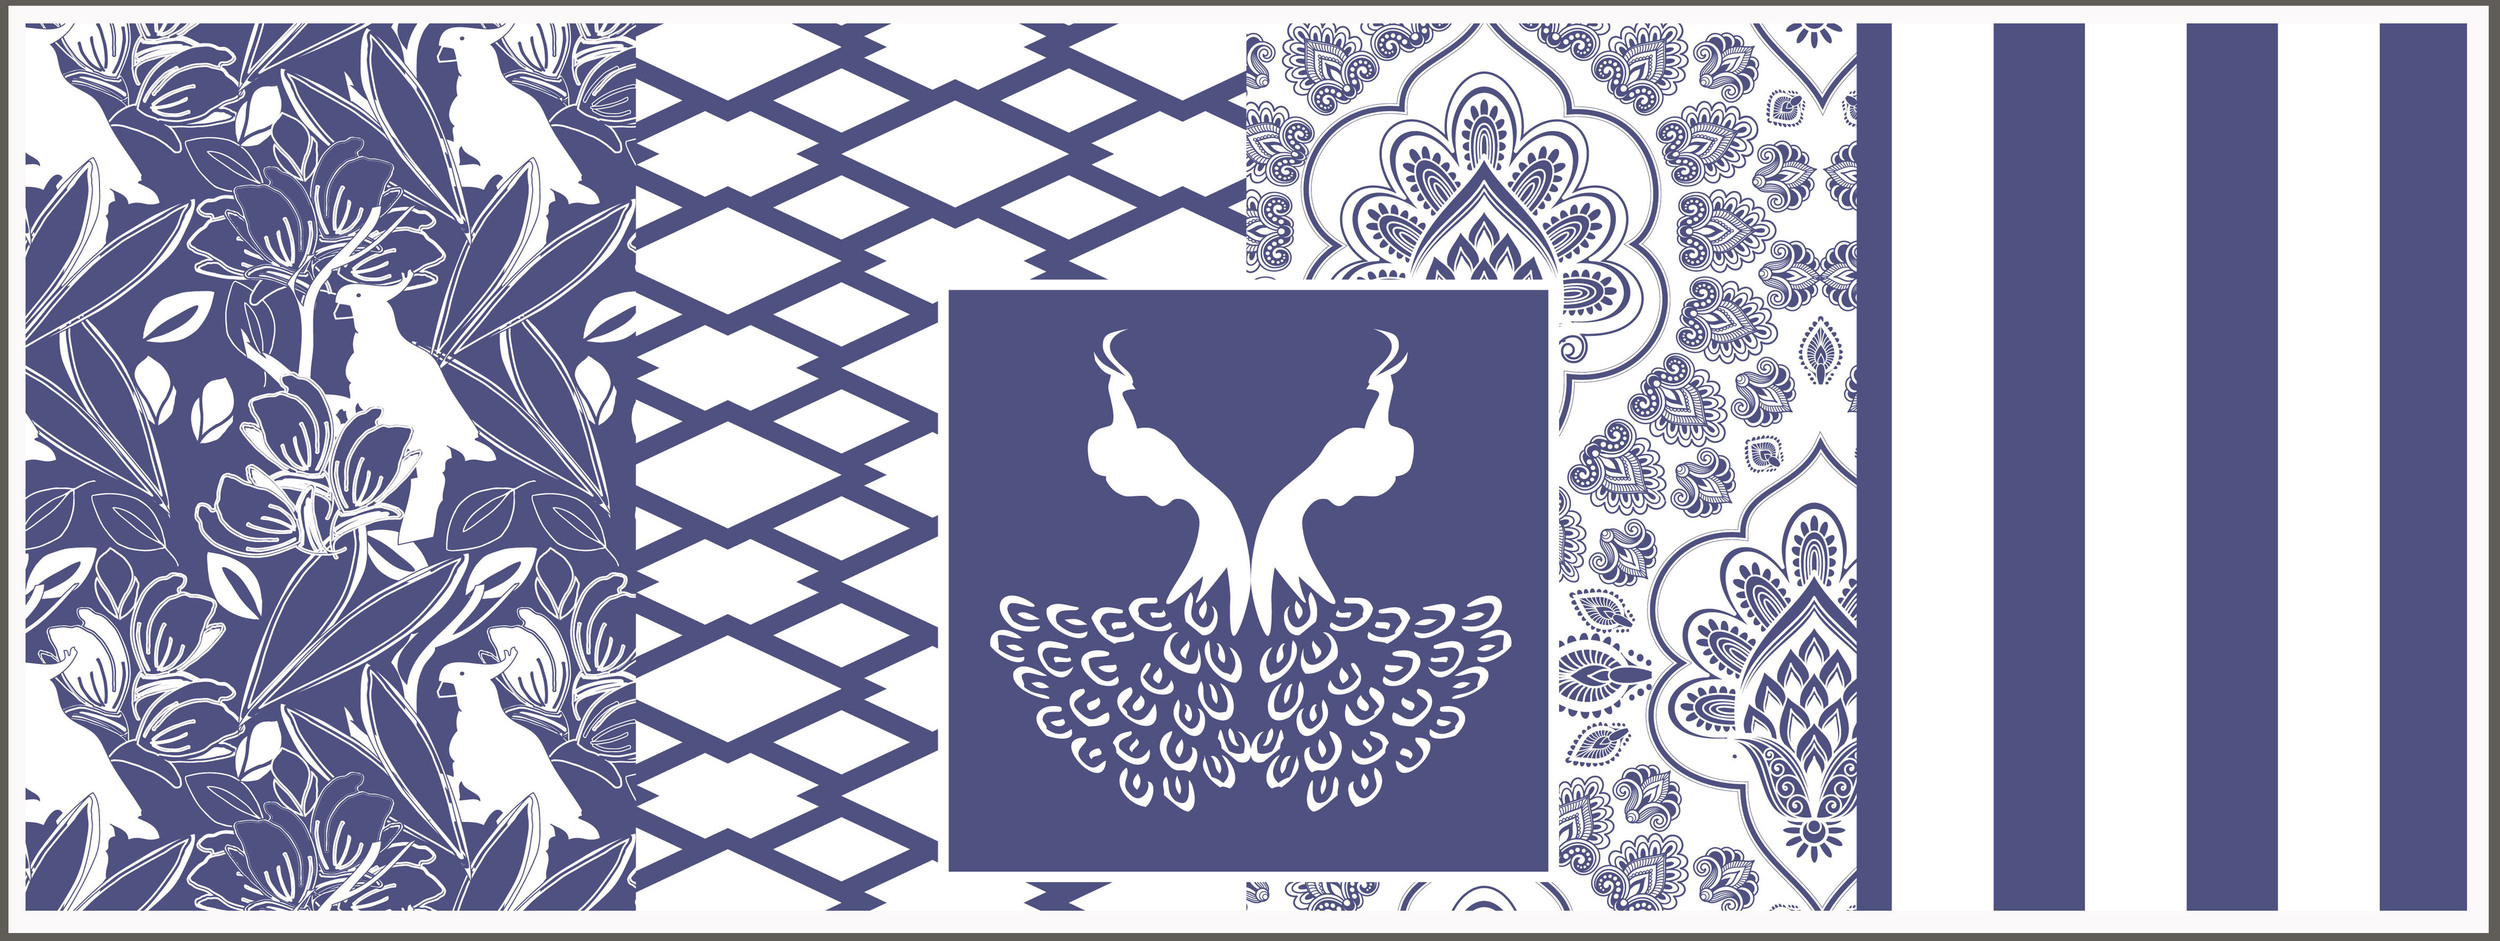 Custom Textile Design.jpg